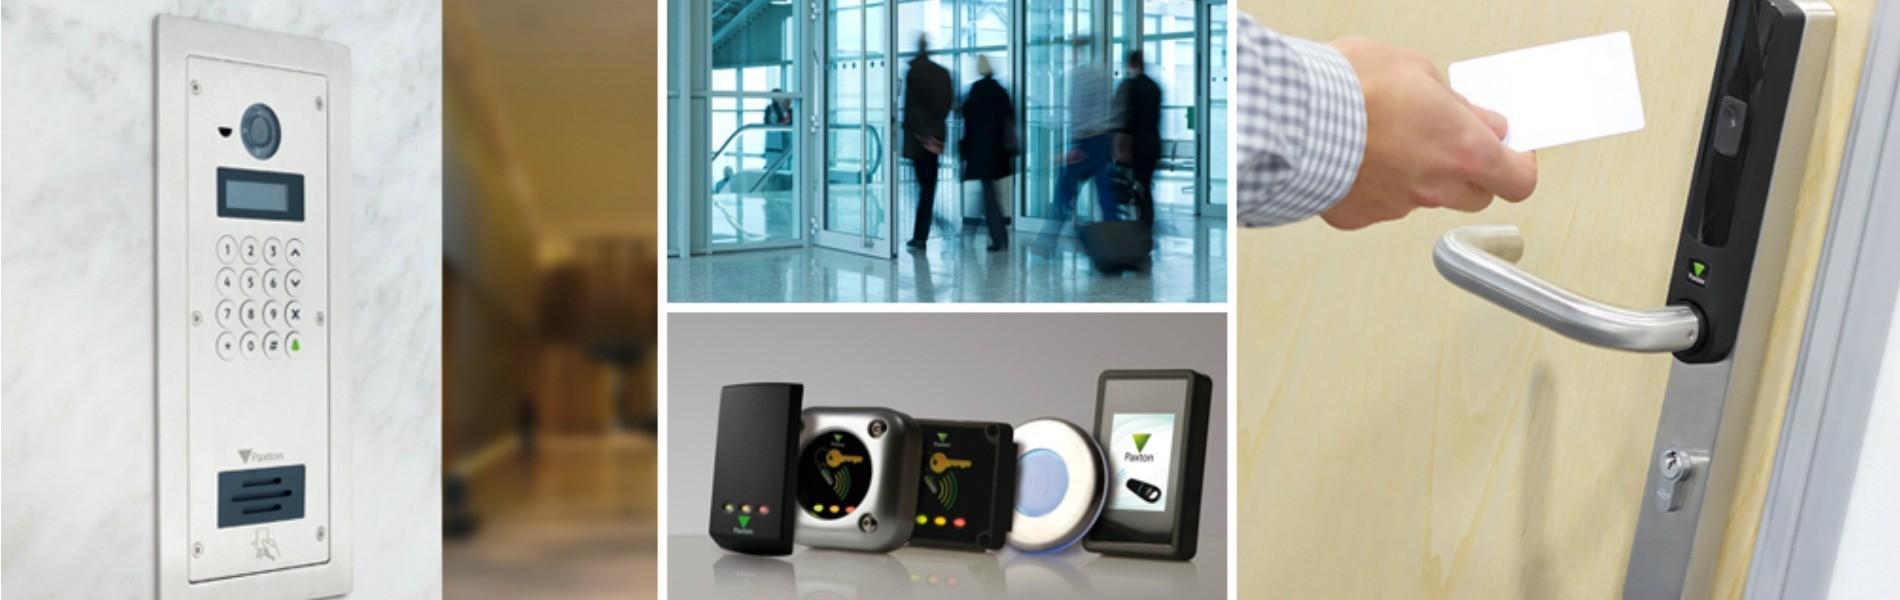 access-control-main.jpg